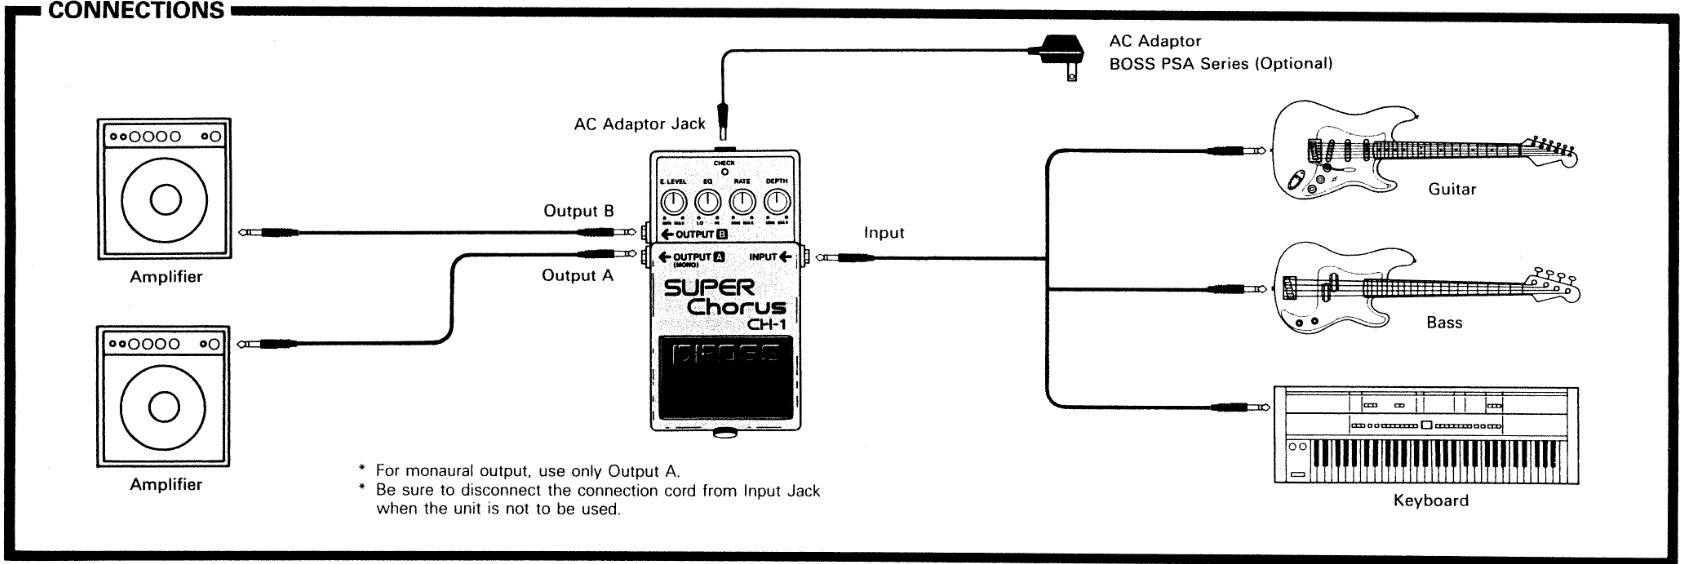 Acoustic Guitar Pedals (2)